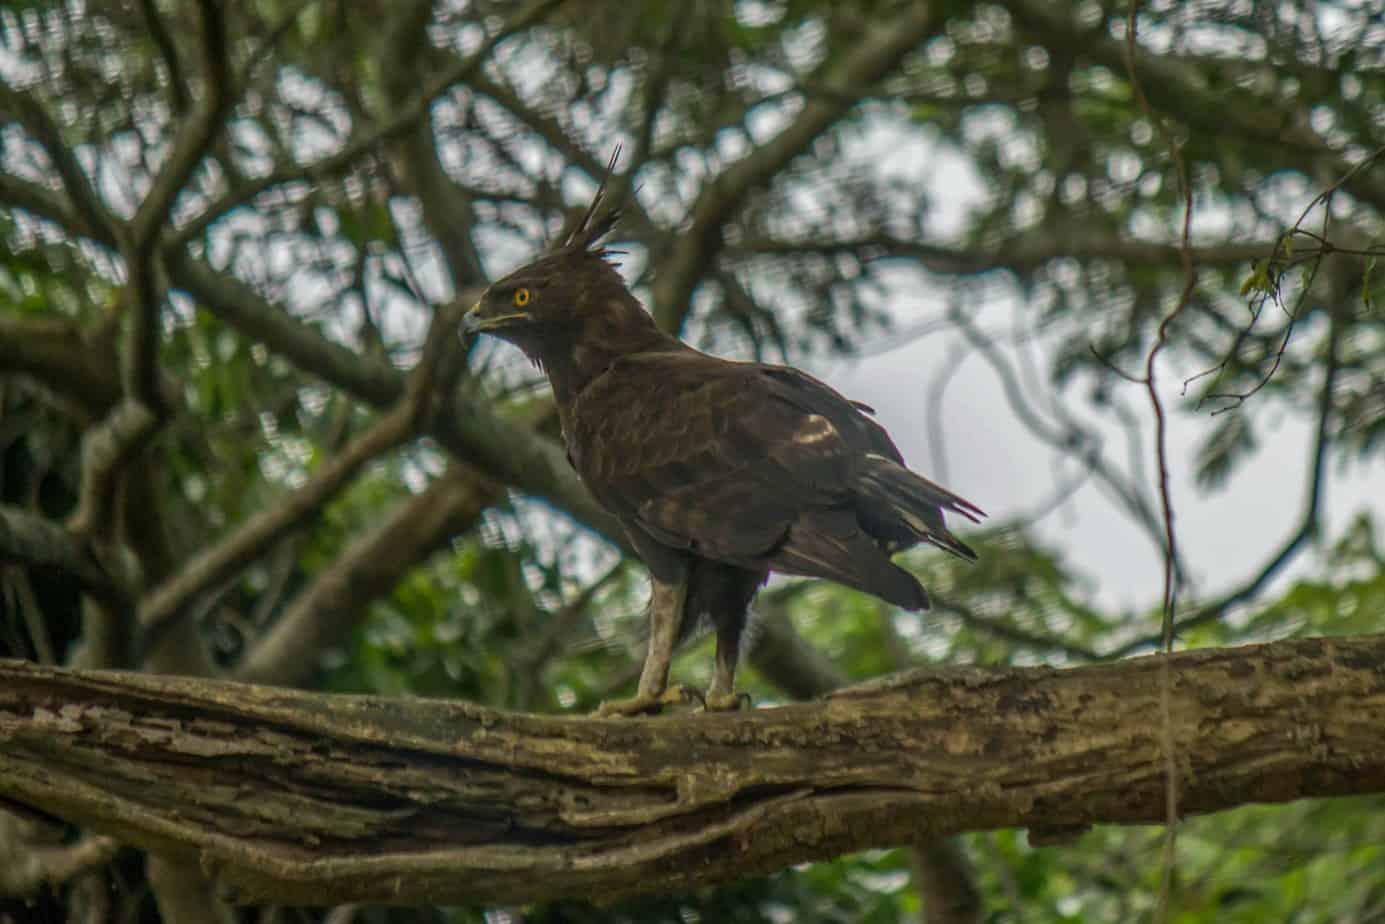 Long-crested Eagle @ Eastern Shores - iSimangaliso Wetland Park. Photo: Håvard Rosenlund